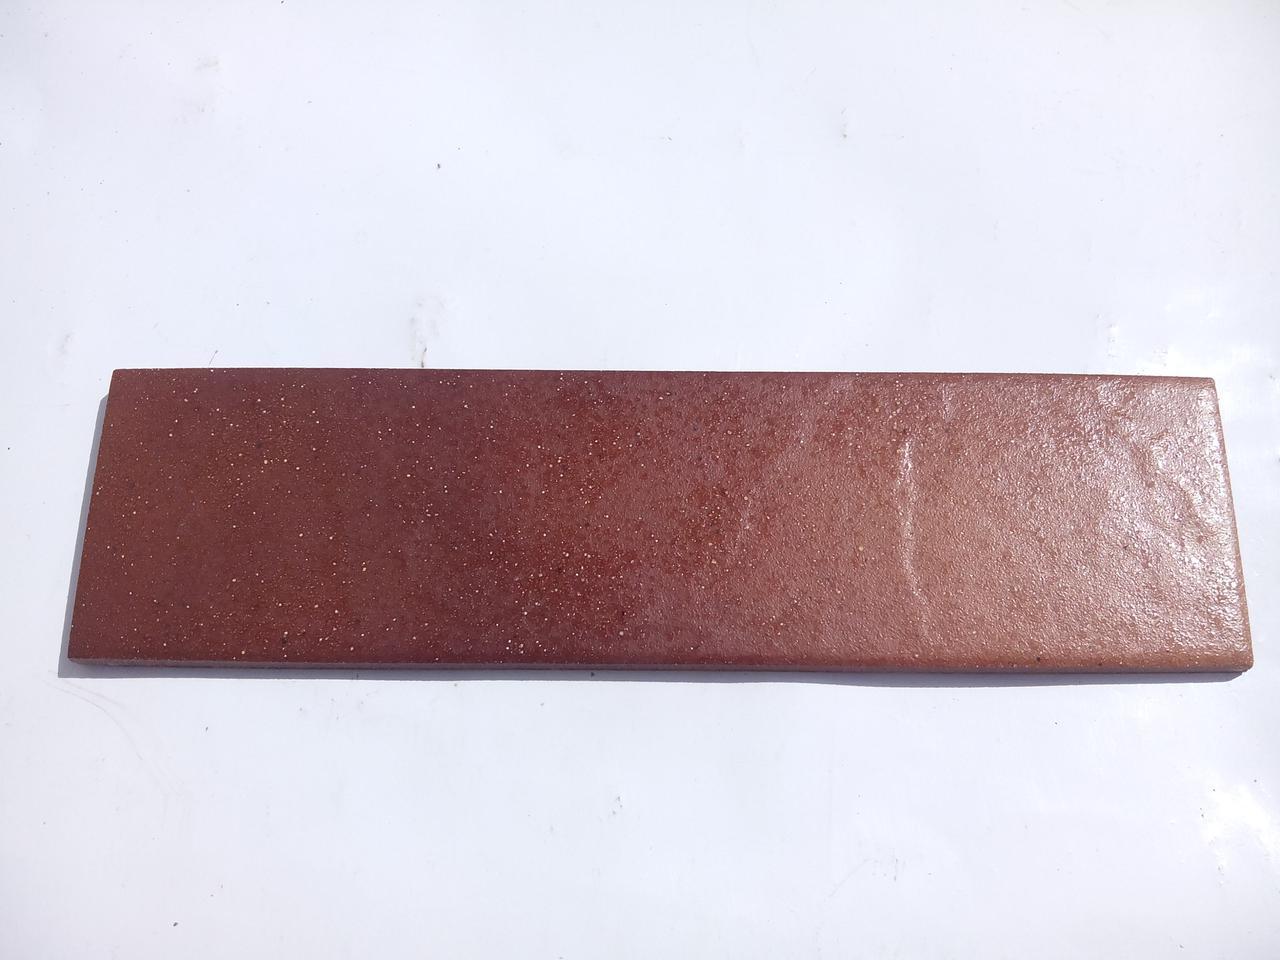 Клинкерная фасадная плитка Paradyz Taurus Brown 245x65x7.4